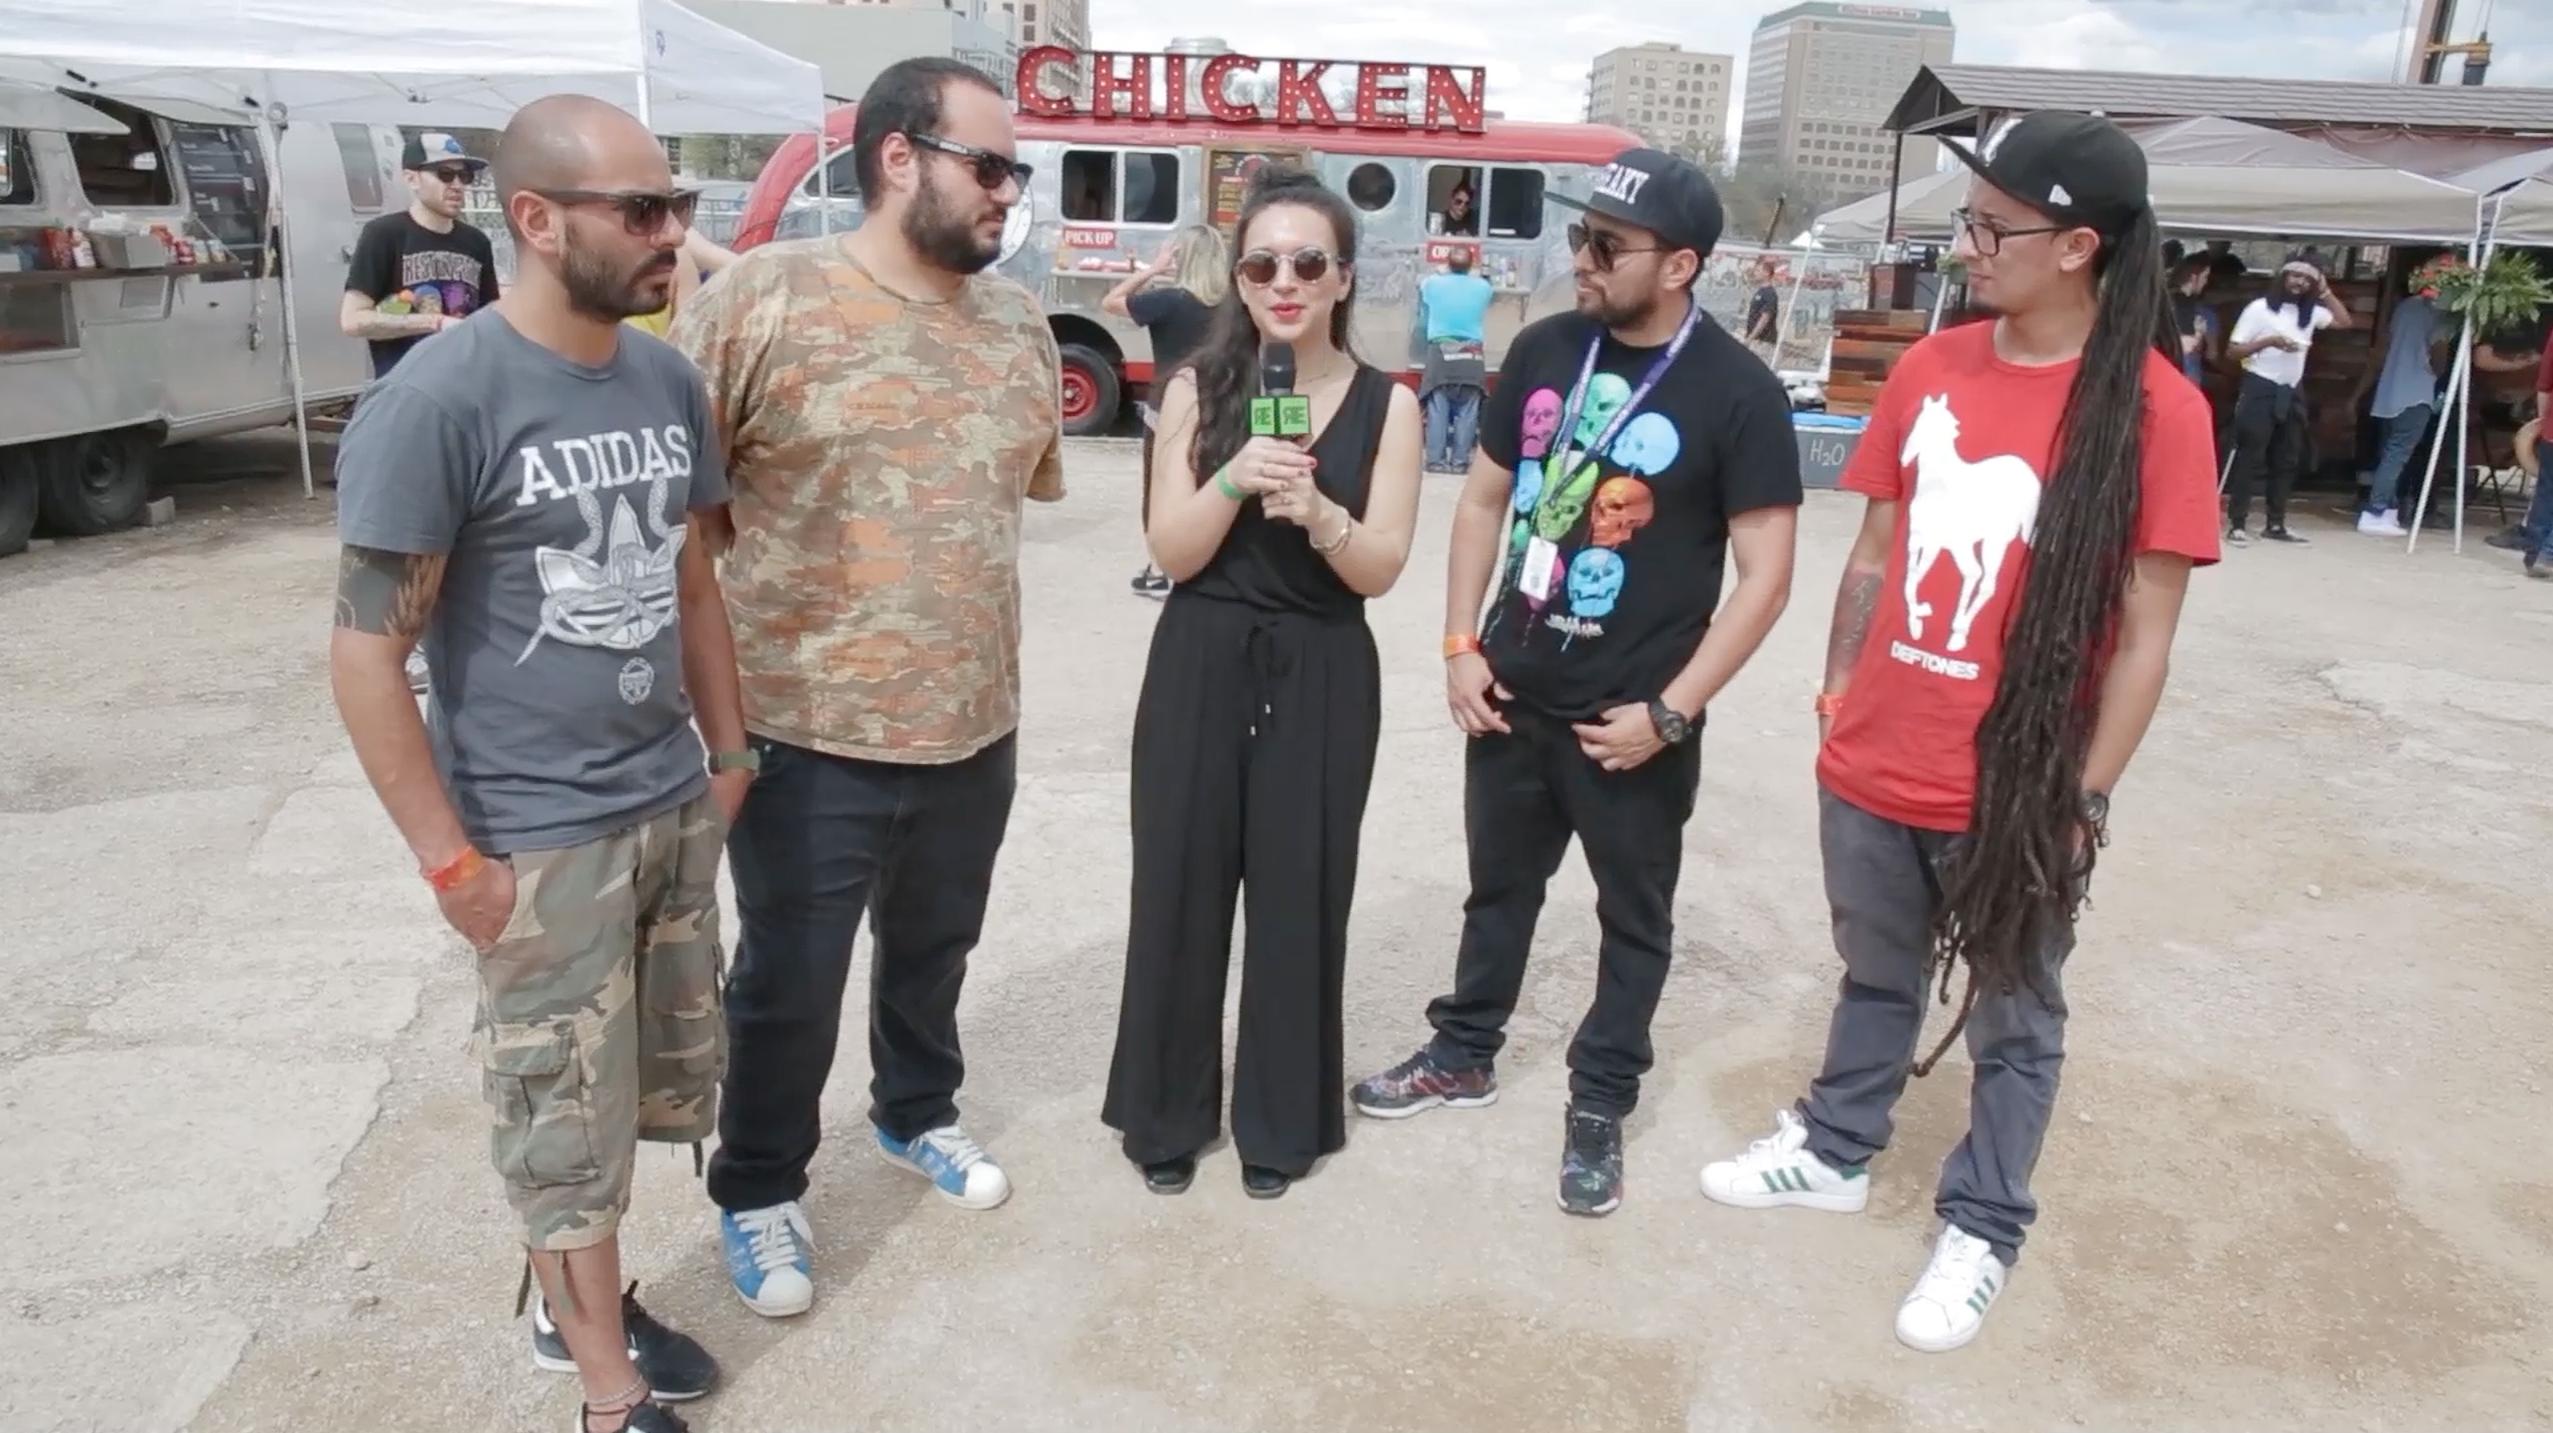 Interview: El Freaky Colectivo at SXSW 2015